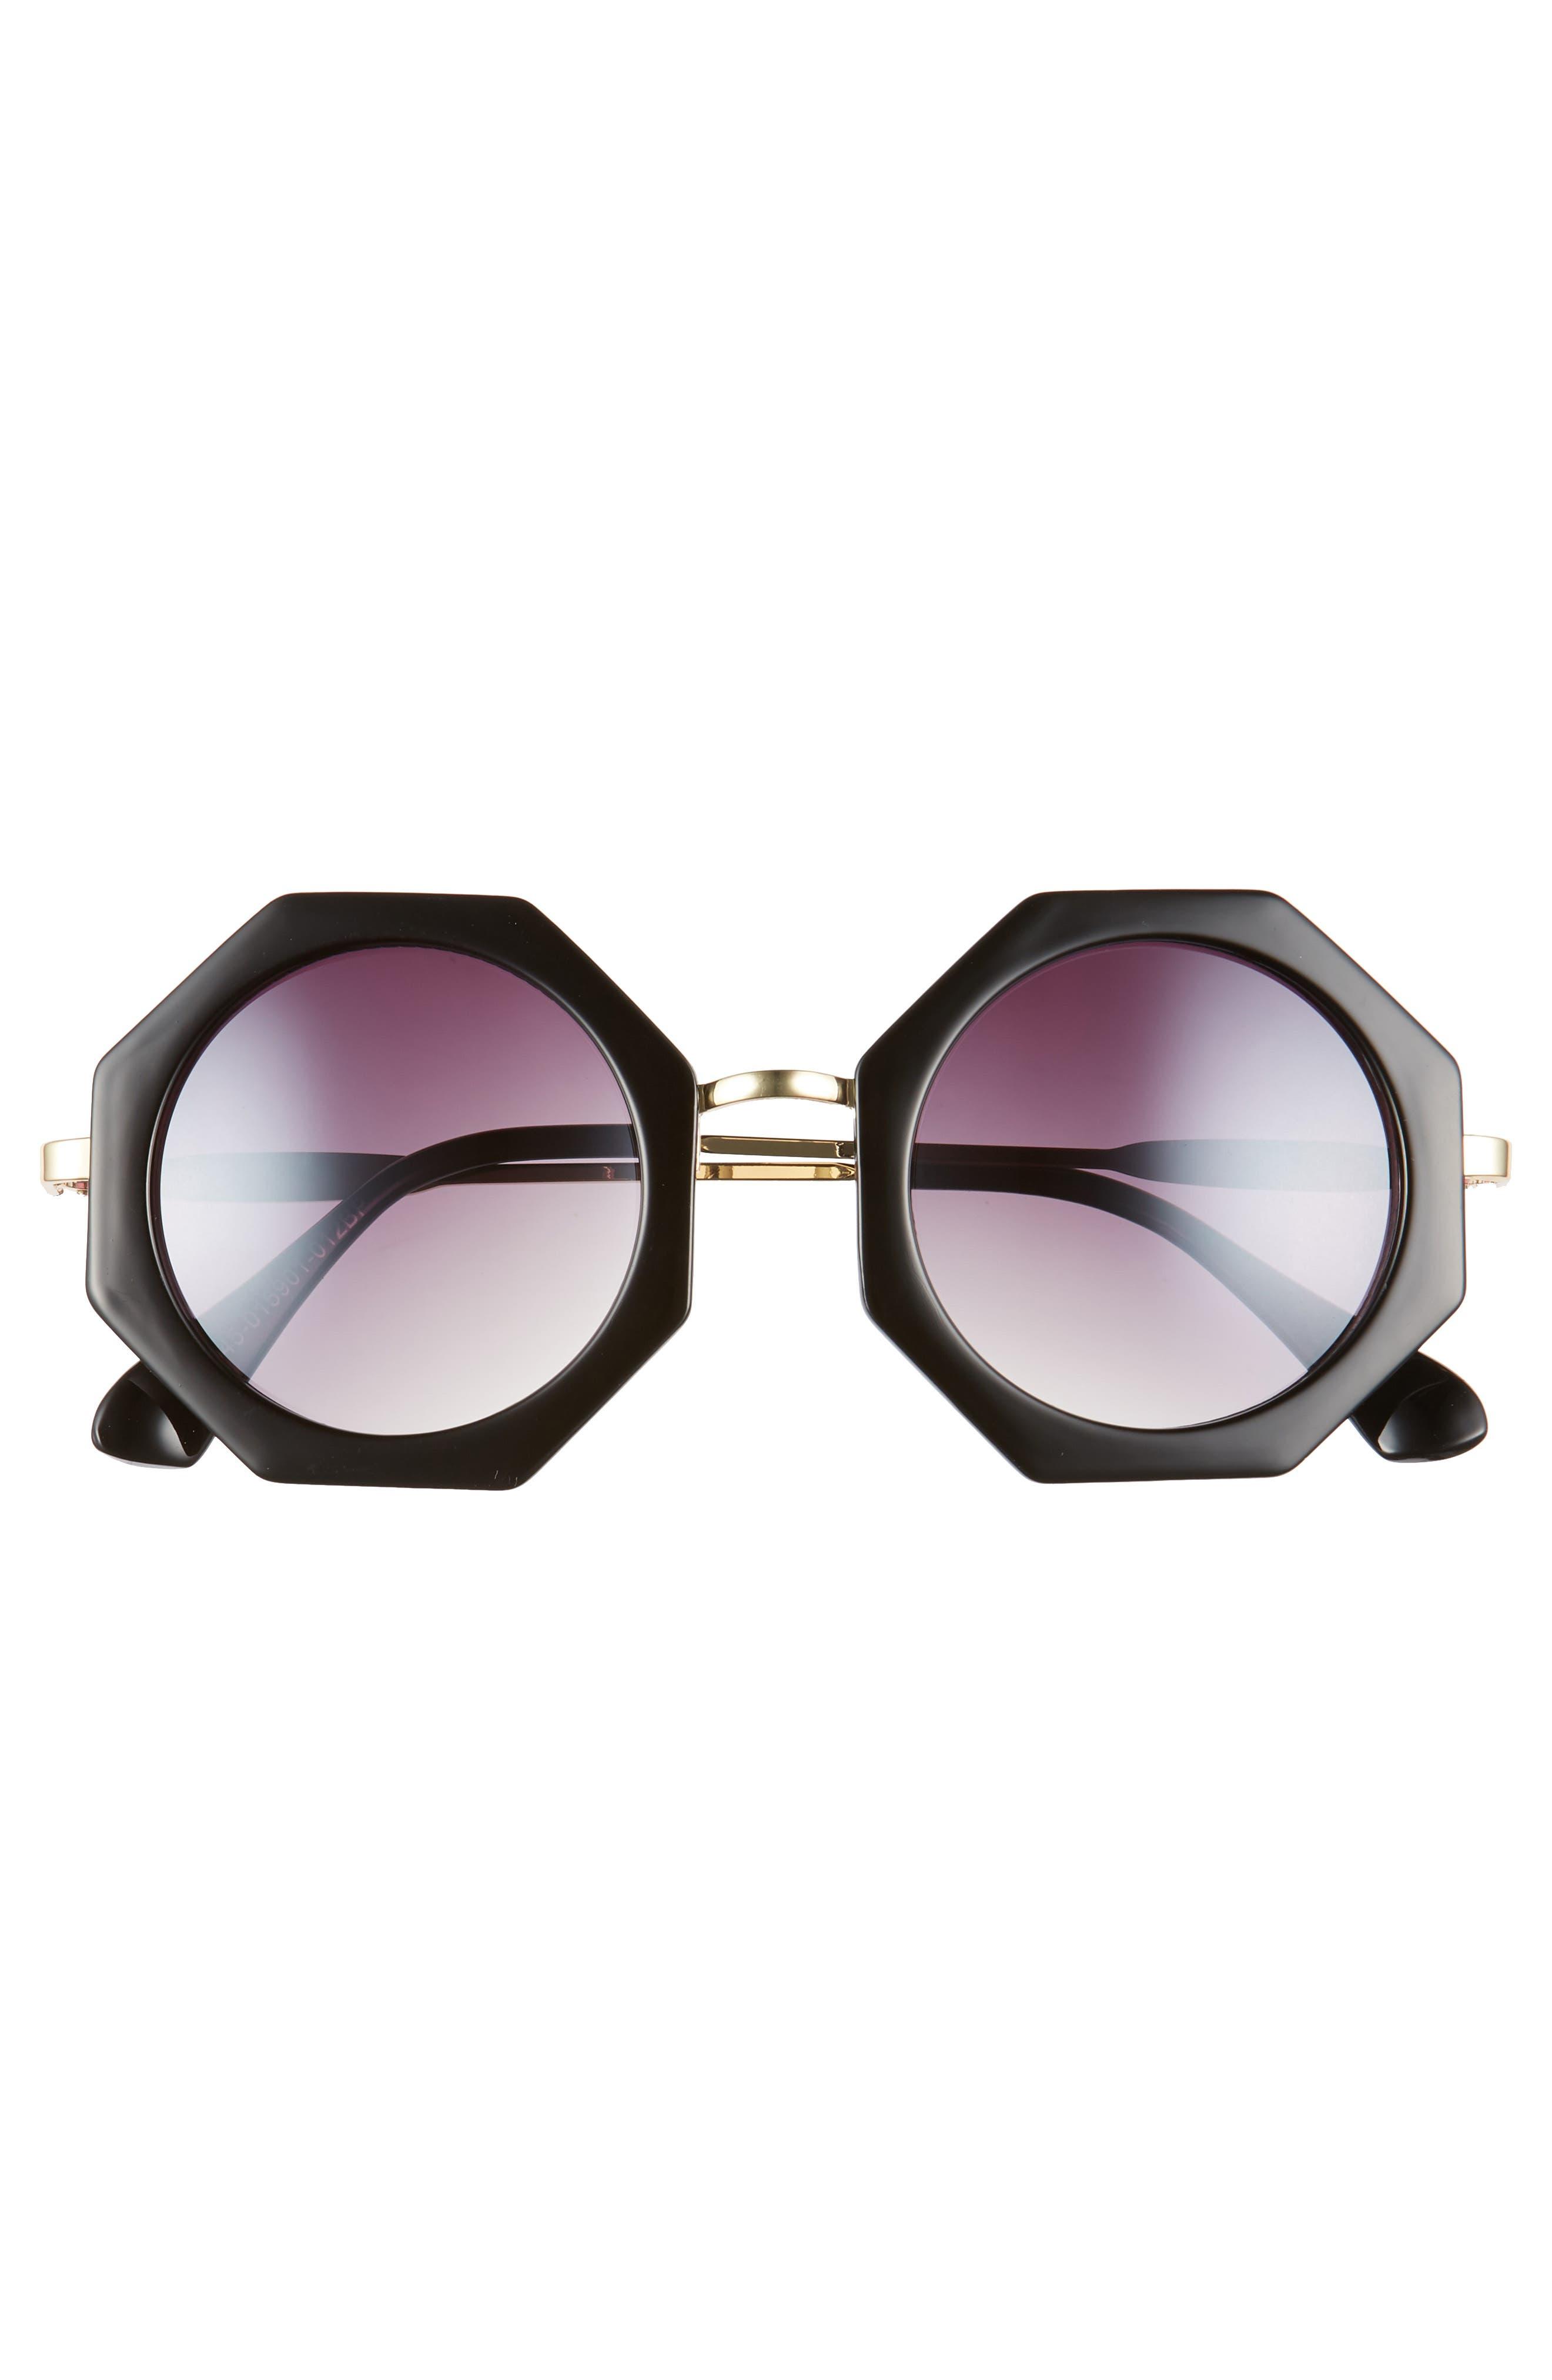 54m Hexagonal Sunglasses,                             Alternate thumbnail 2, color,                             Black/ Gold